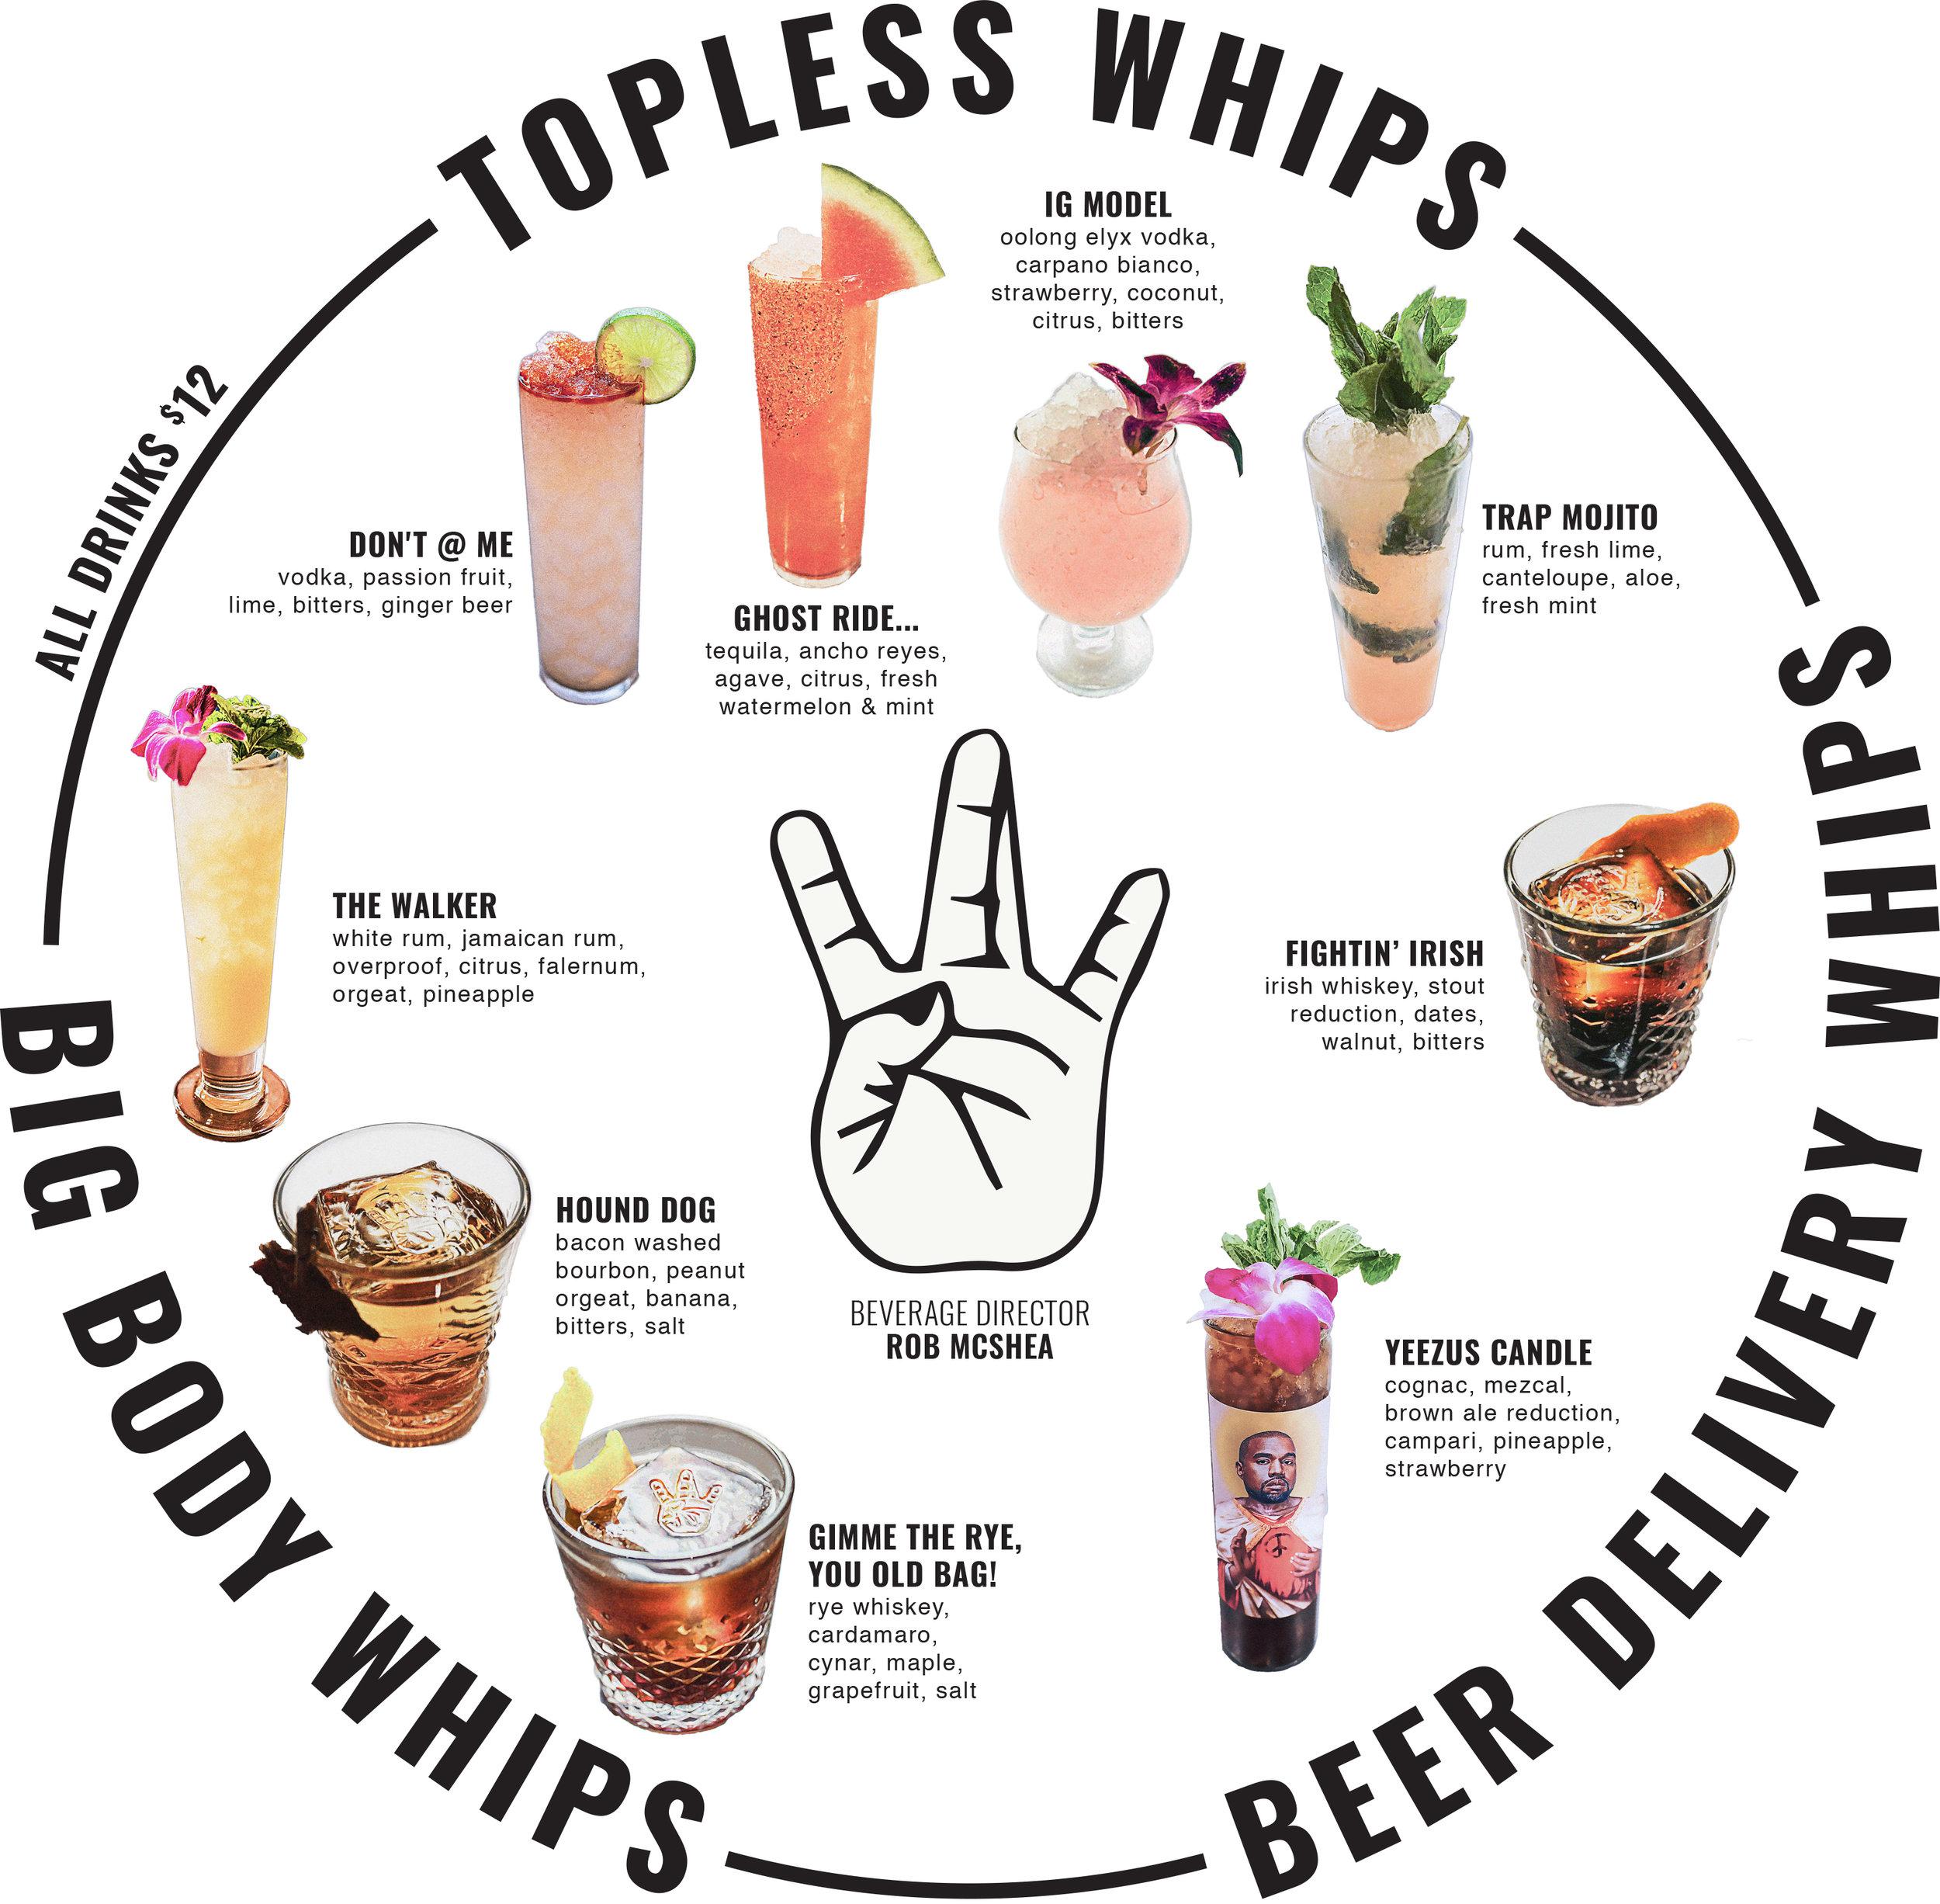 whiphand-menu-cocktail-PRINT-1.jpg